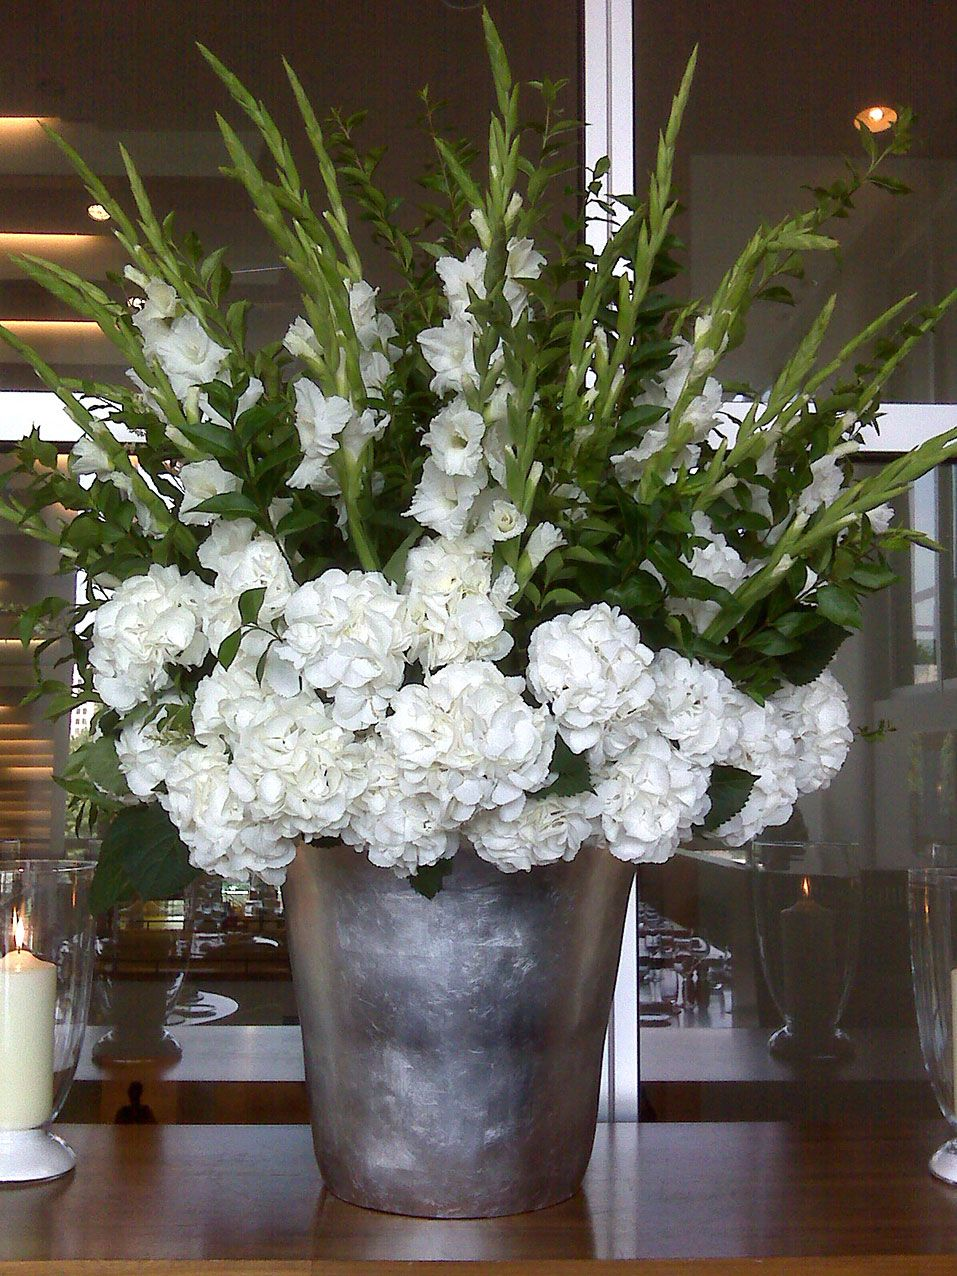 Gallery Mcqueens Florist Hydrangea Arrangements Large Flower Arrangements Hotel Flowers